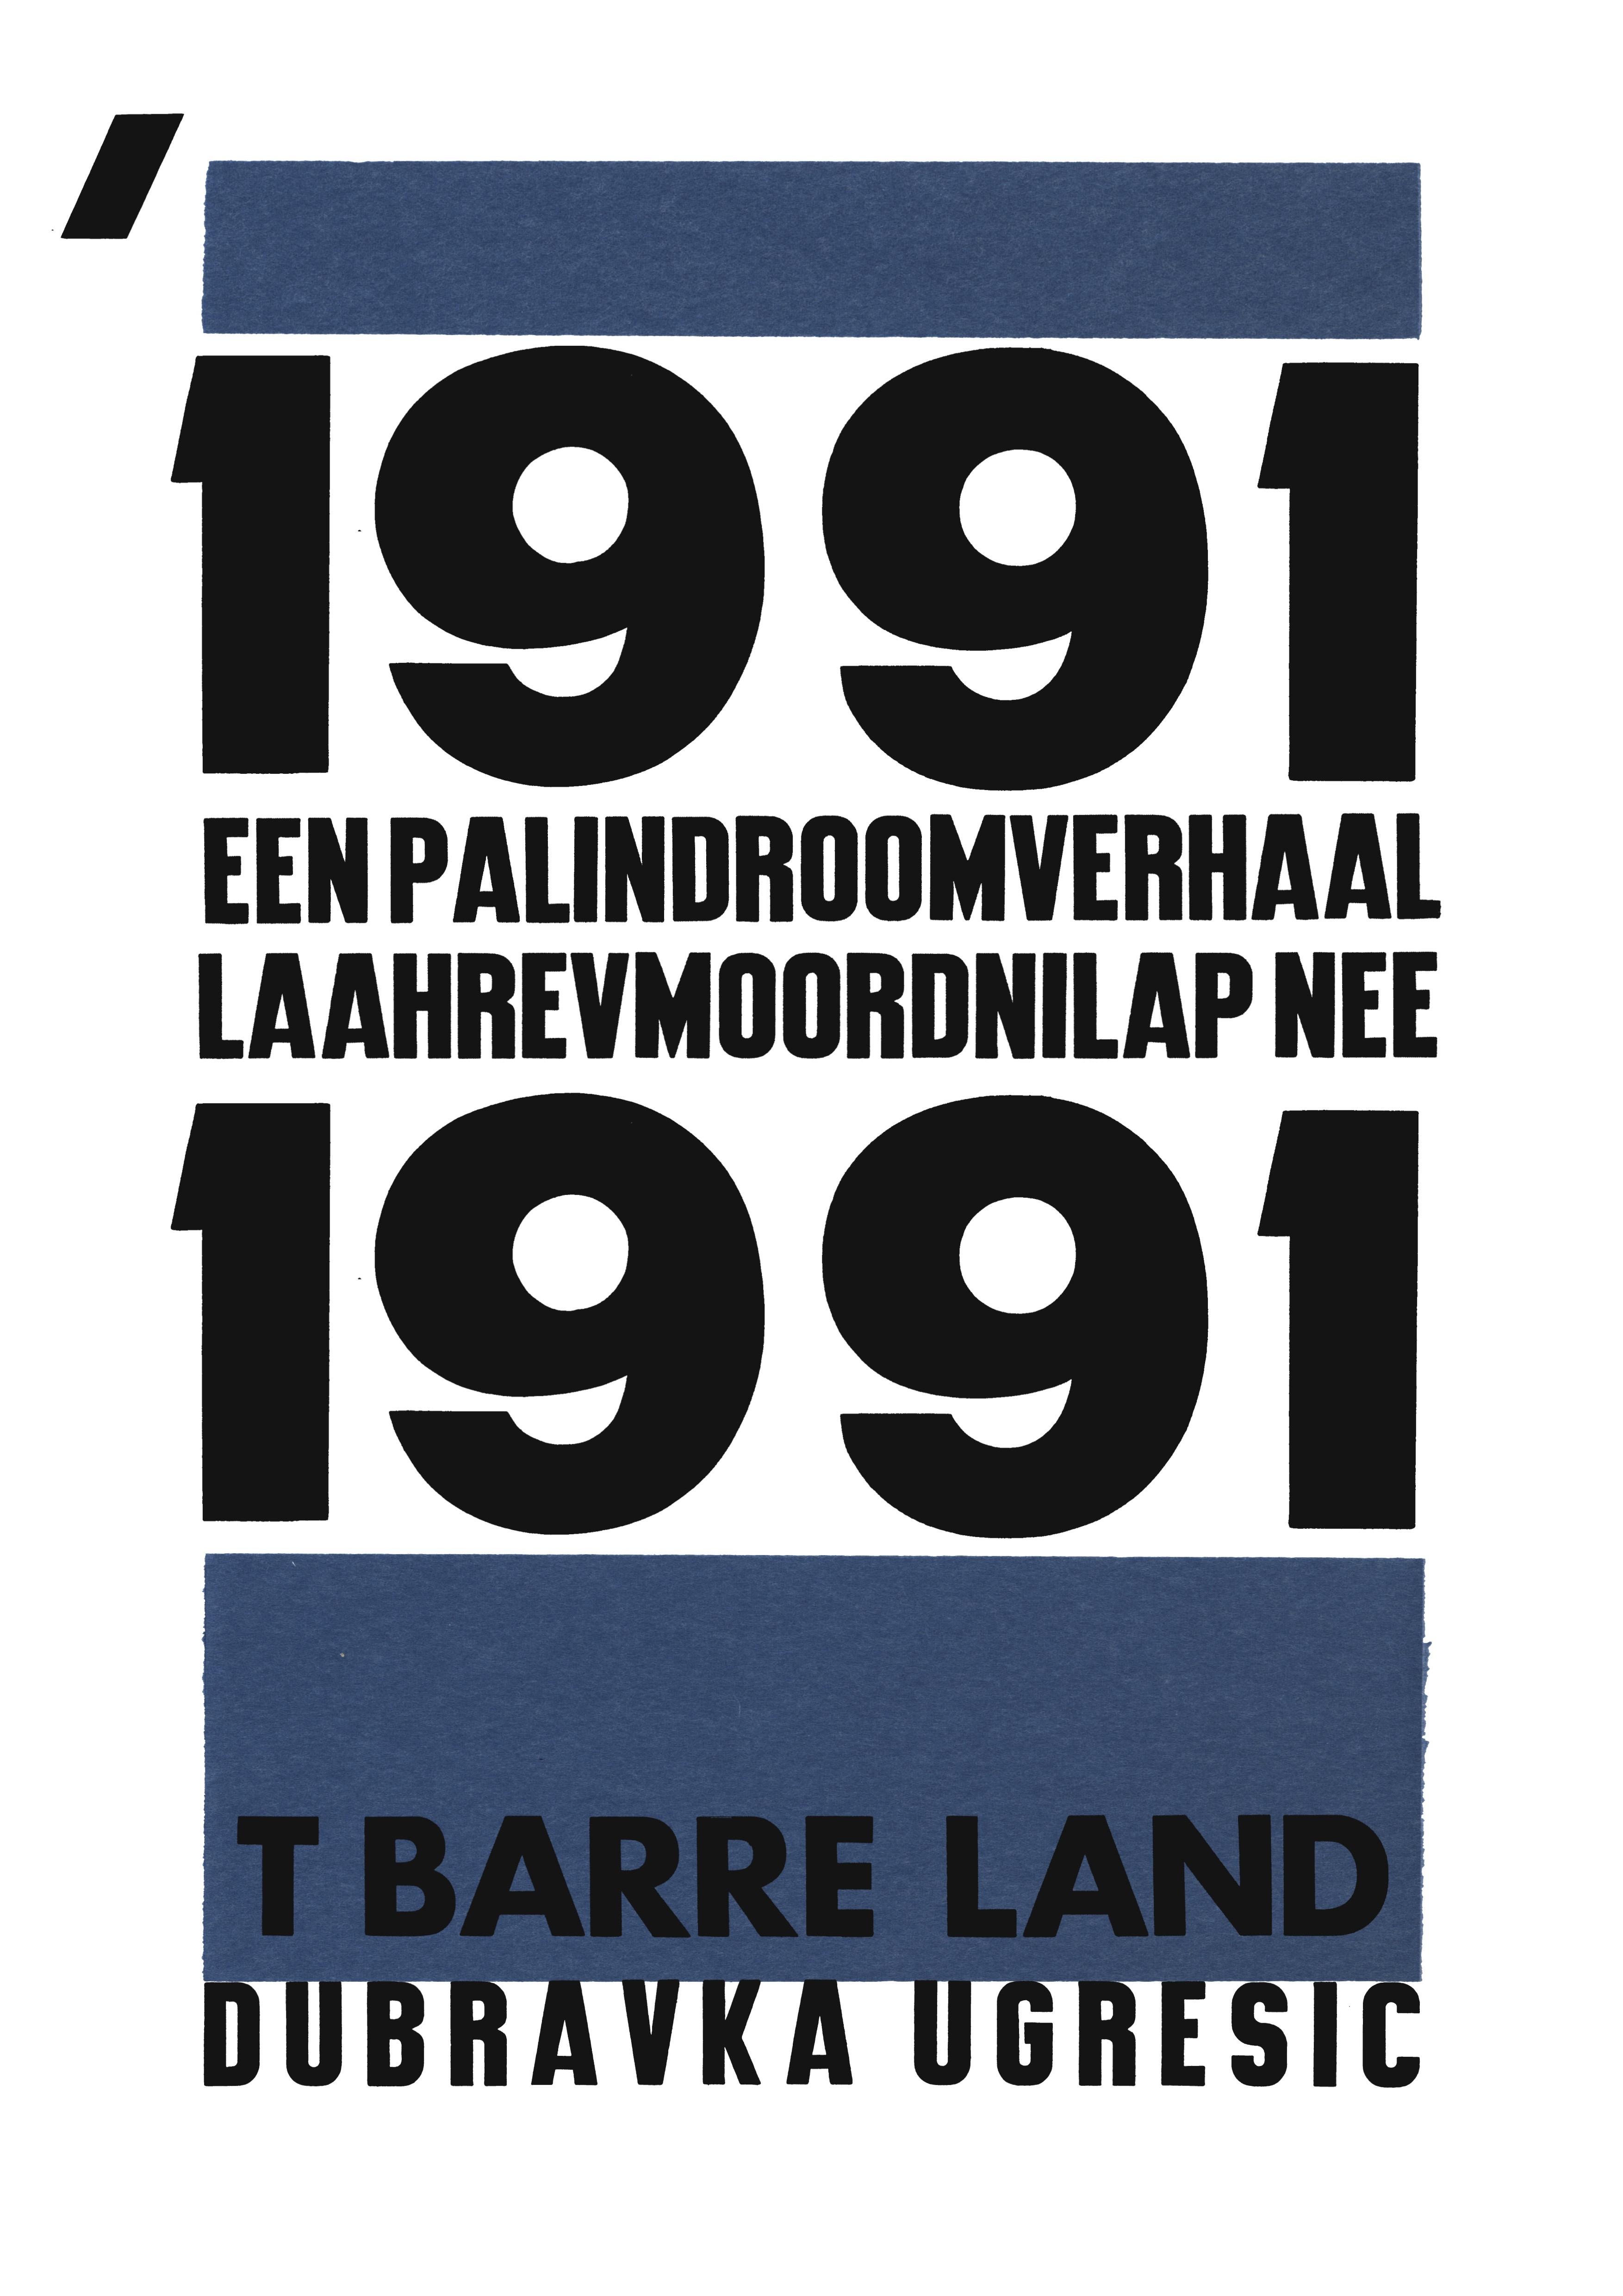 affiche_barre_land_1